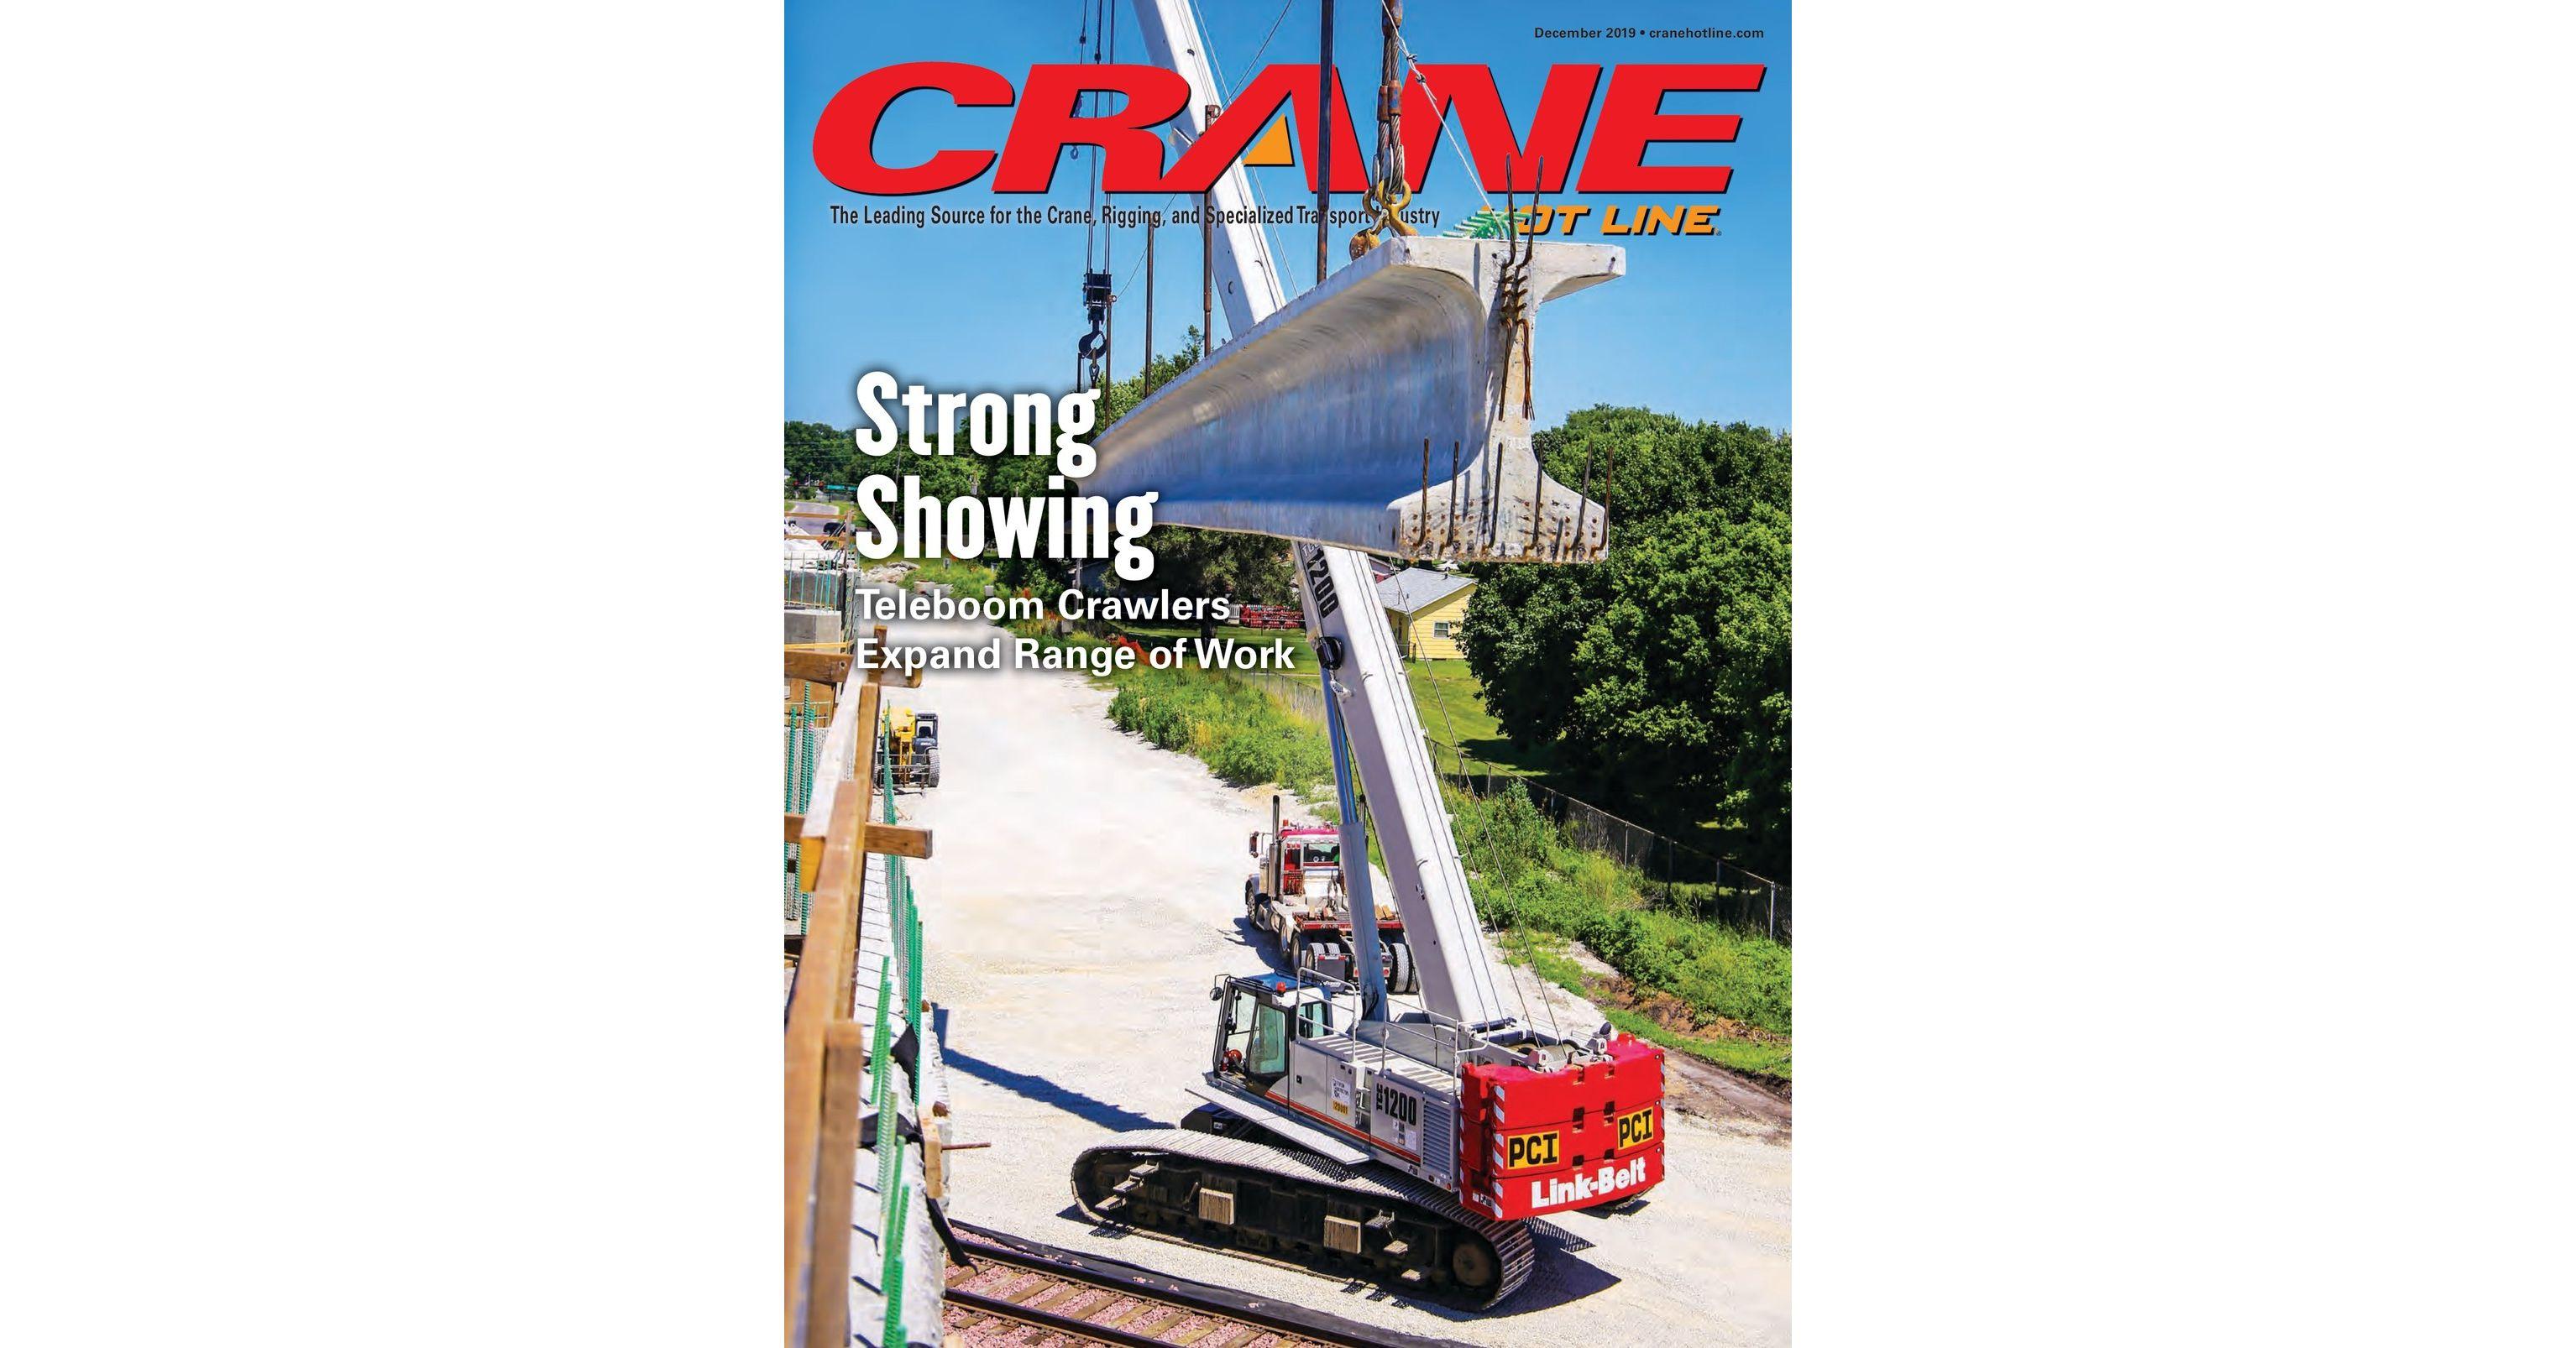 Crane Hot Line 2019 - December